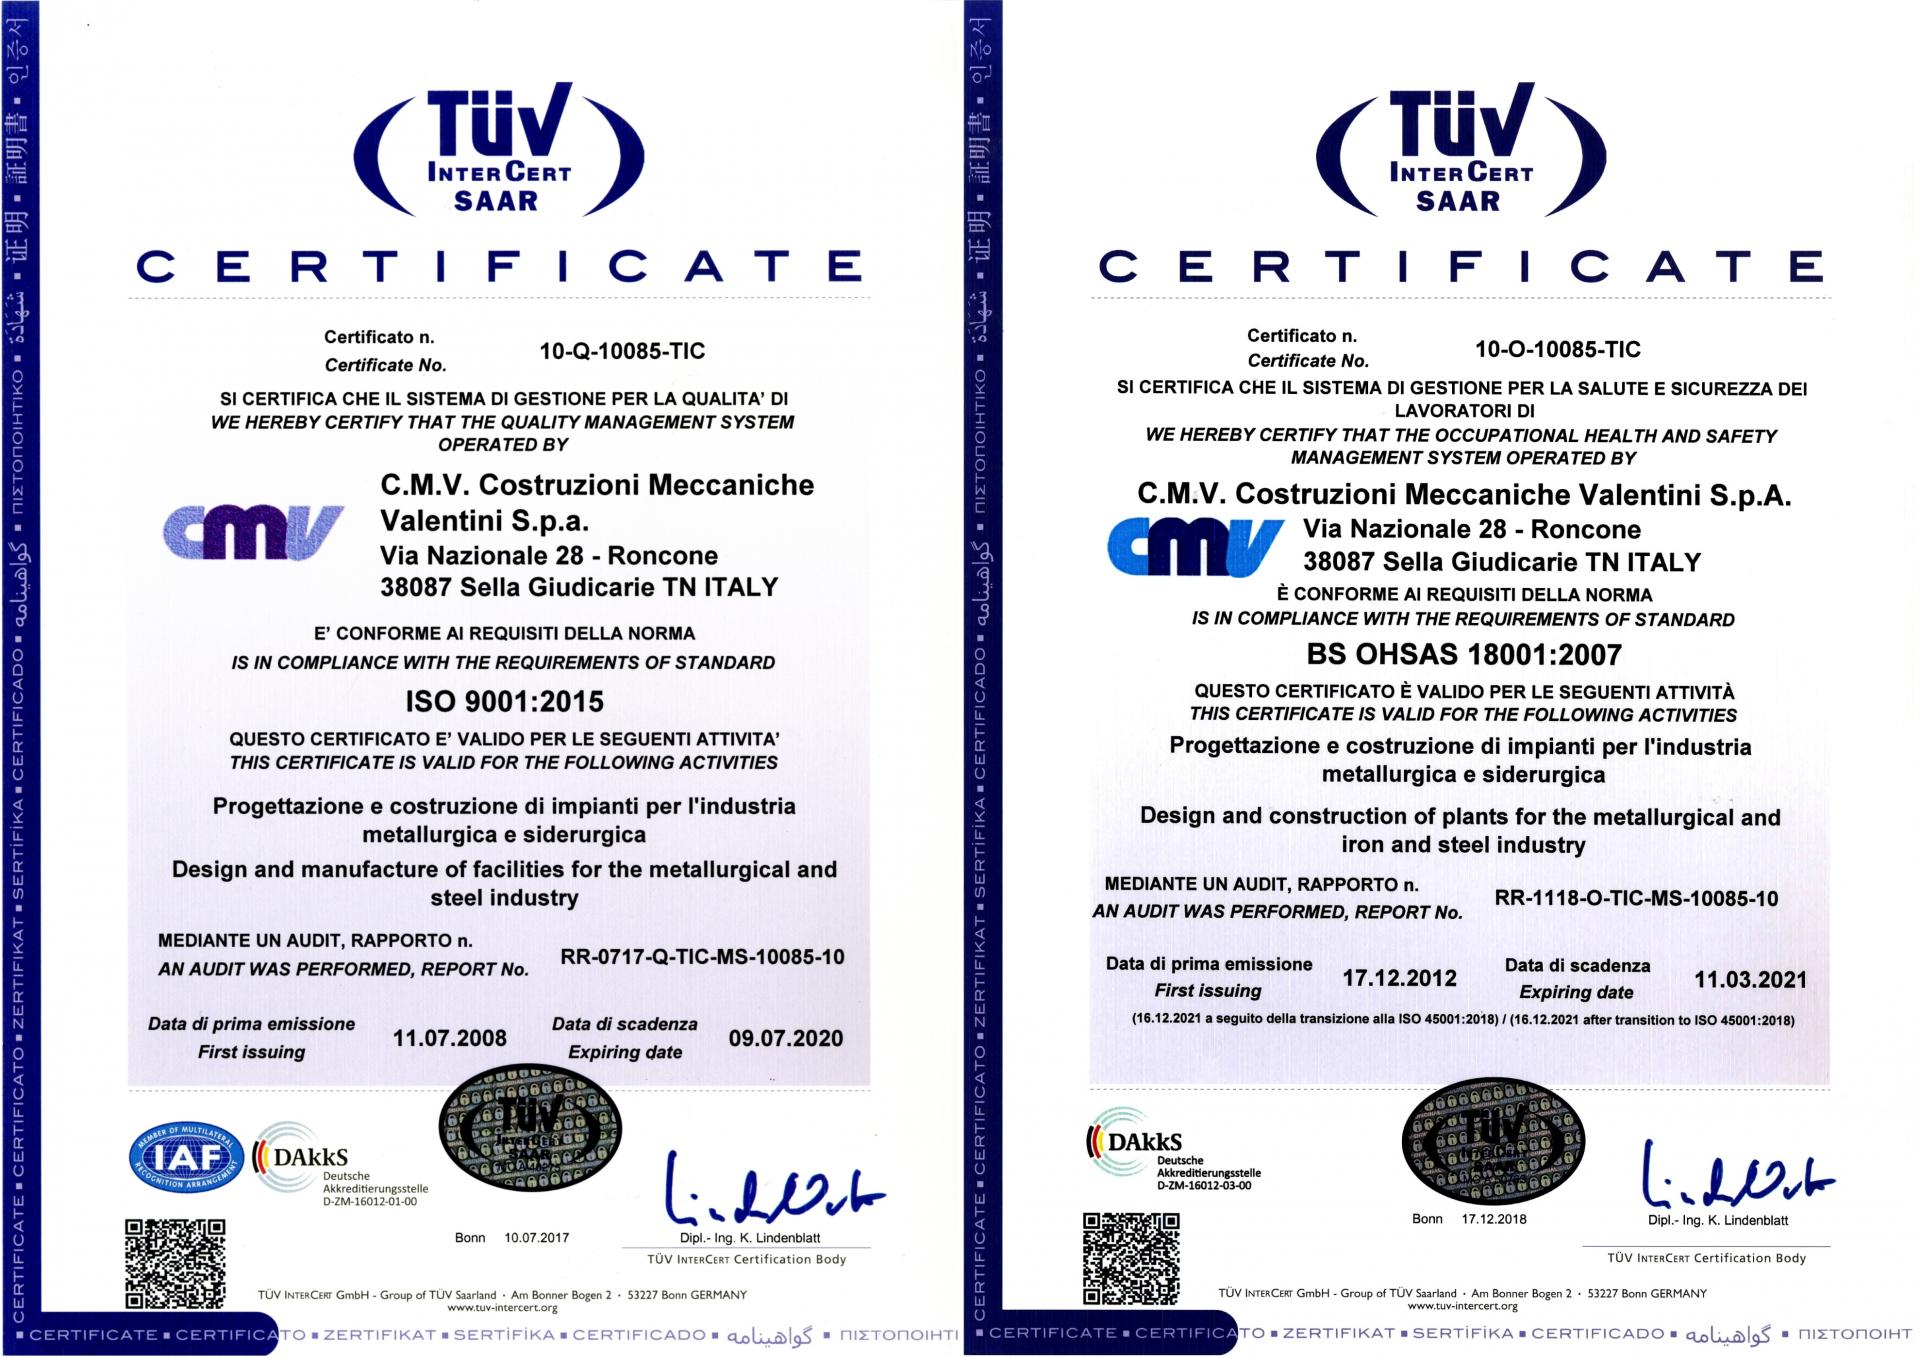 Certificati TUF ISO 9001-2015 - OHSAS 18001-2007 Rev1